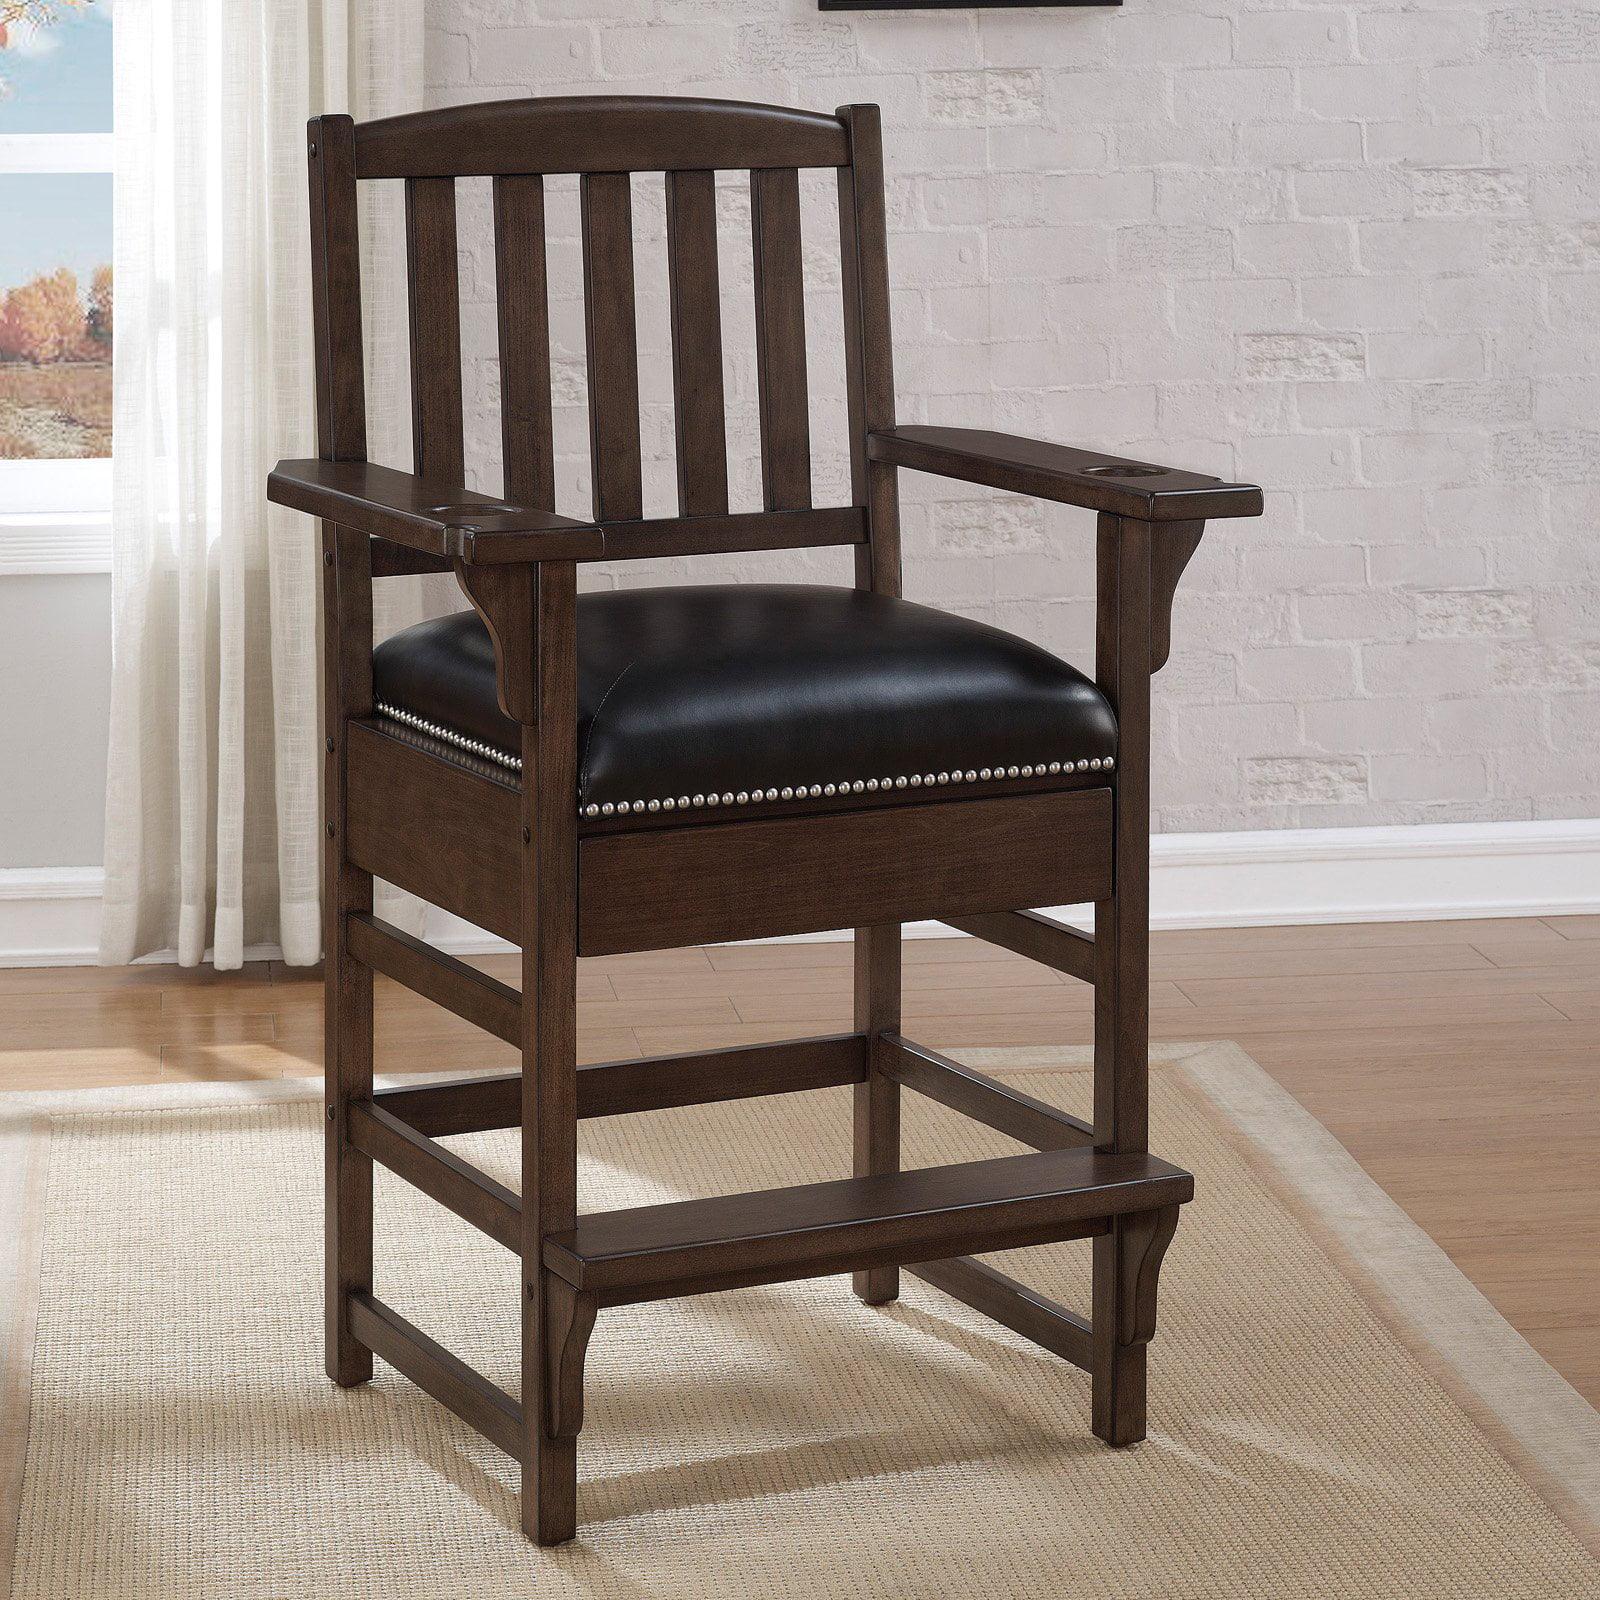 AHB King Bar Height Chair by AH Billiards